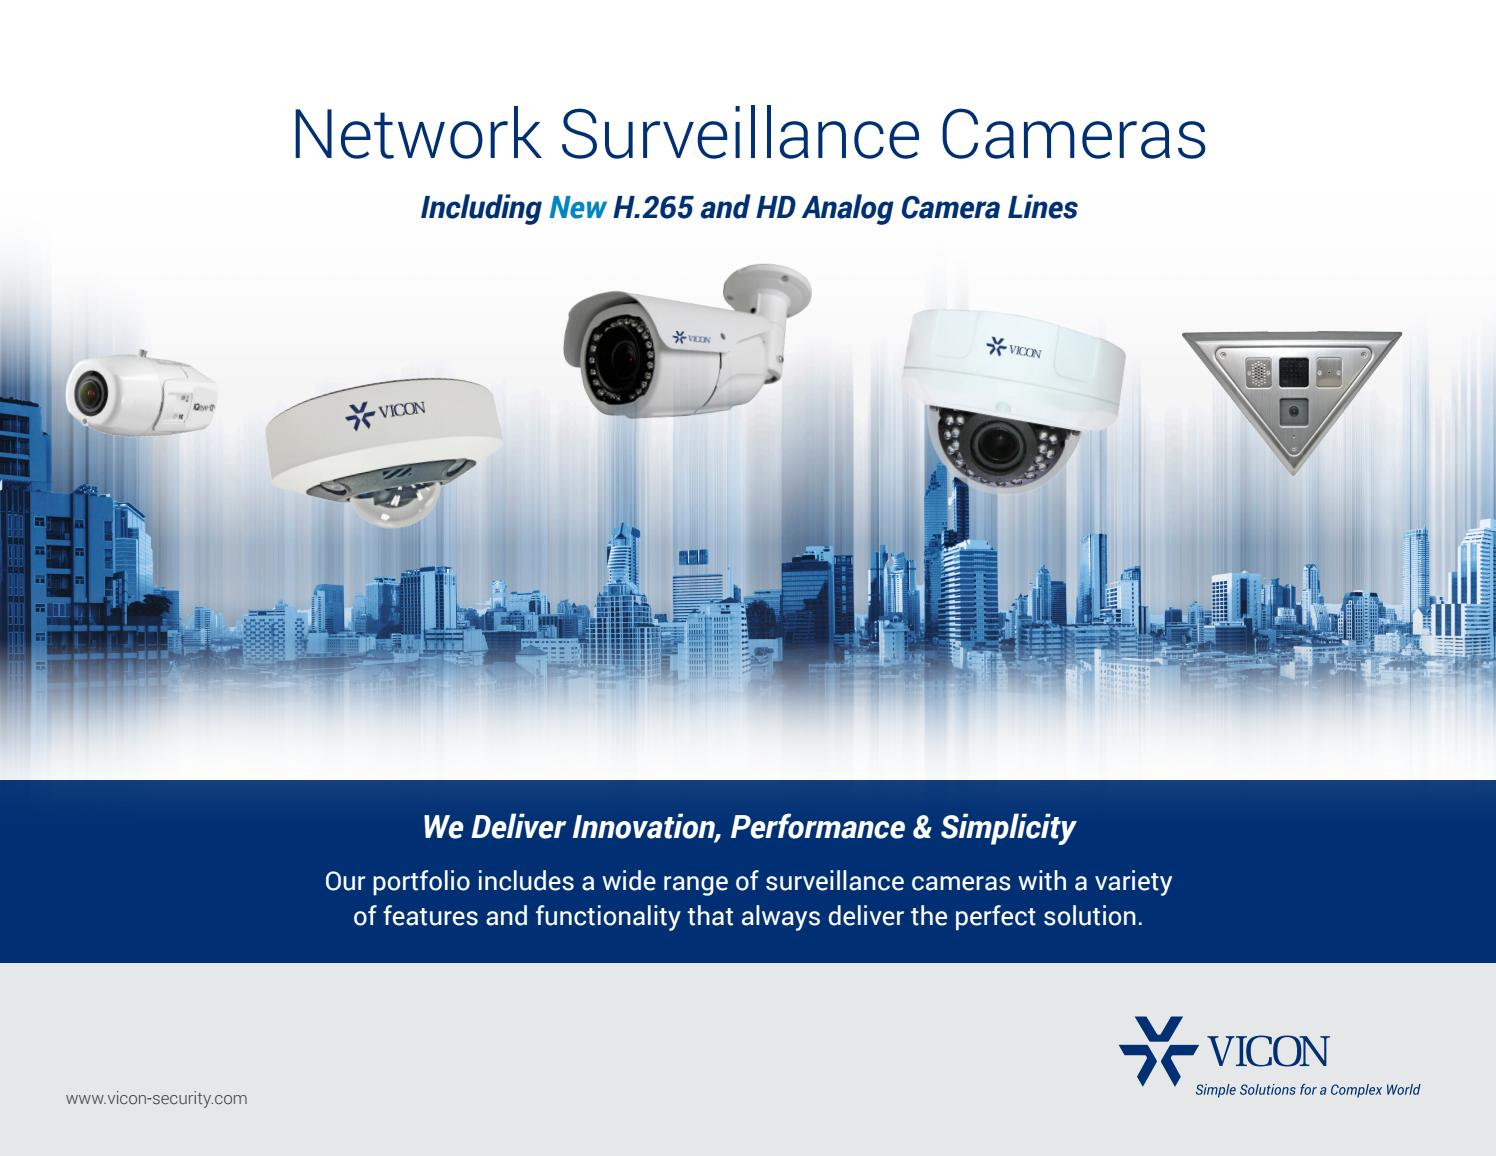 Vicon CCTV Egypt